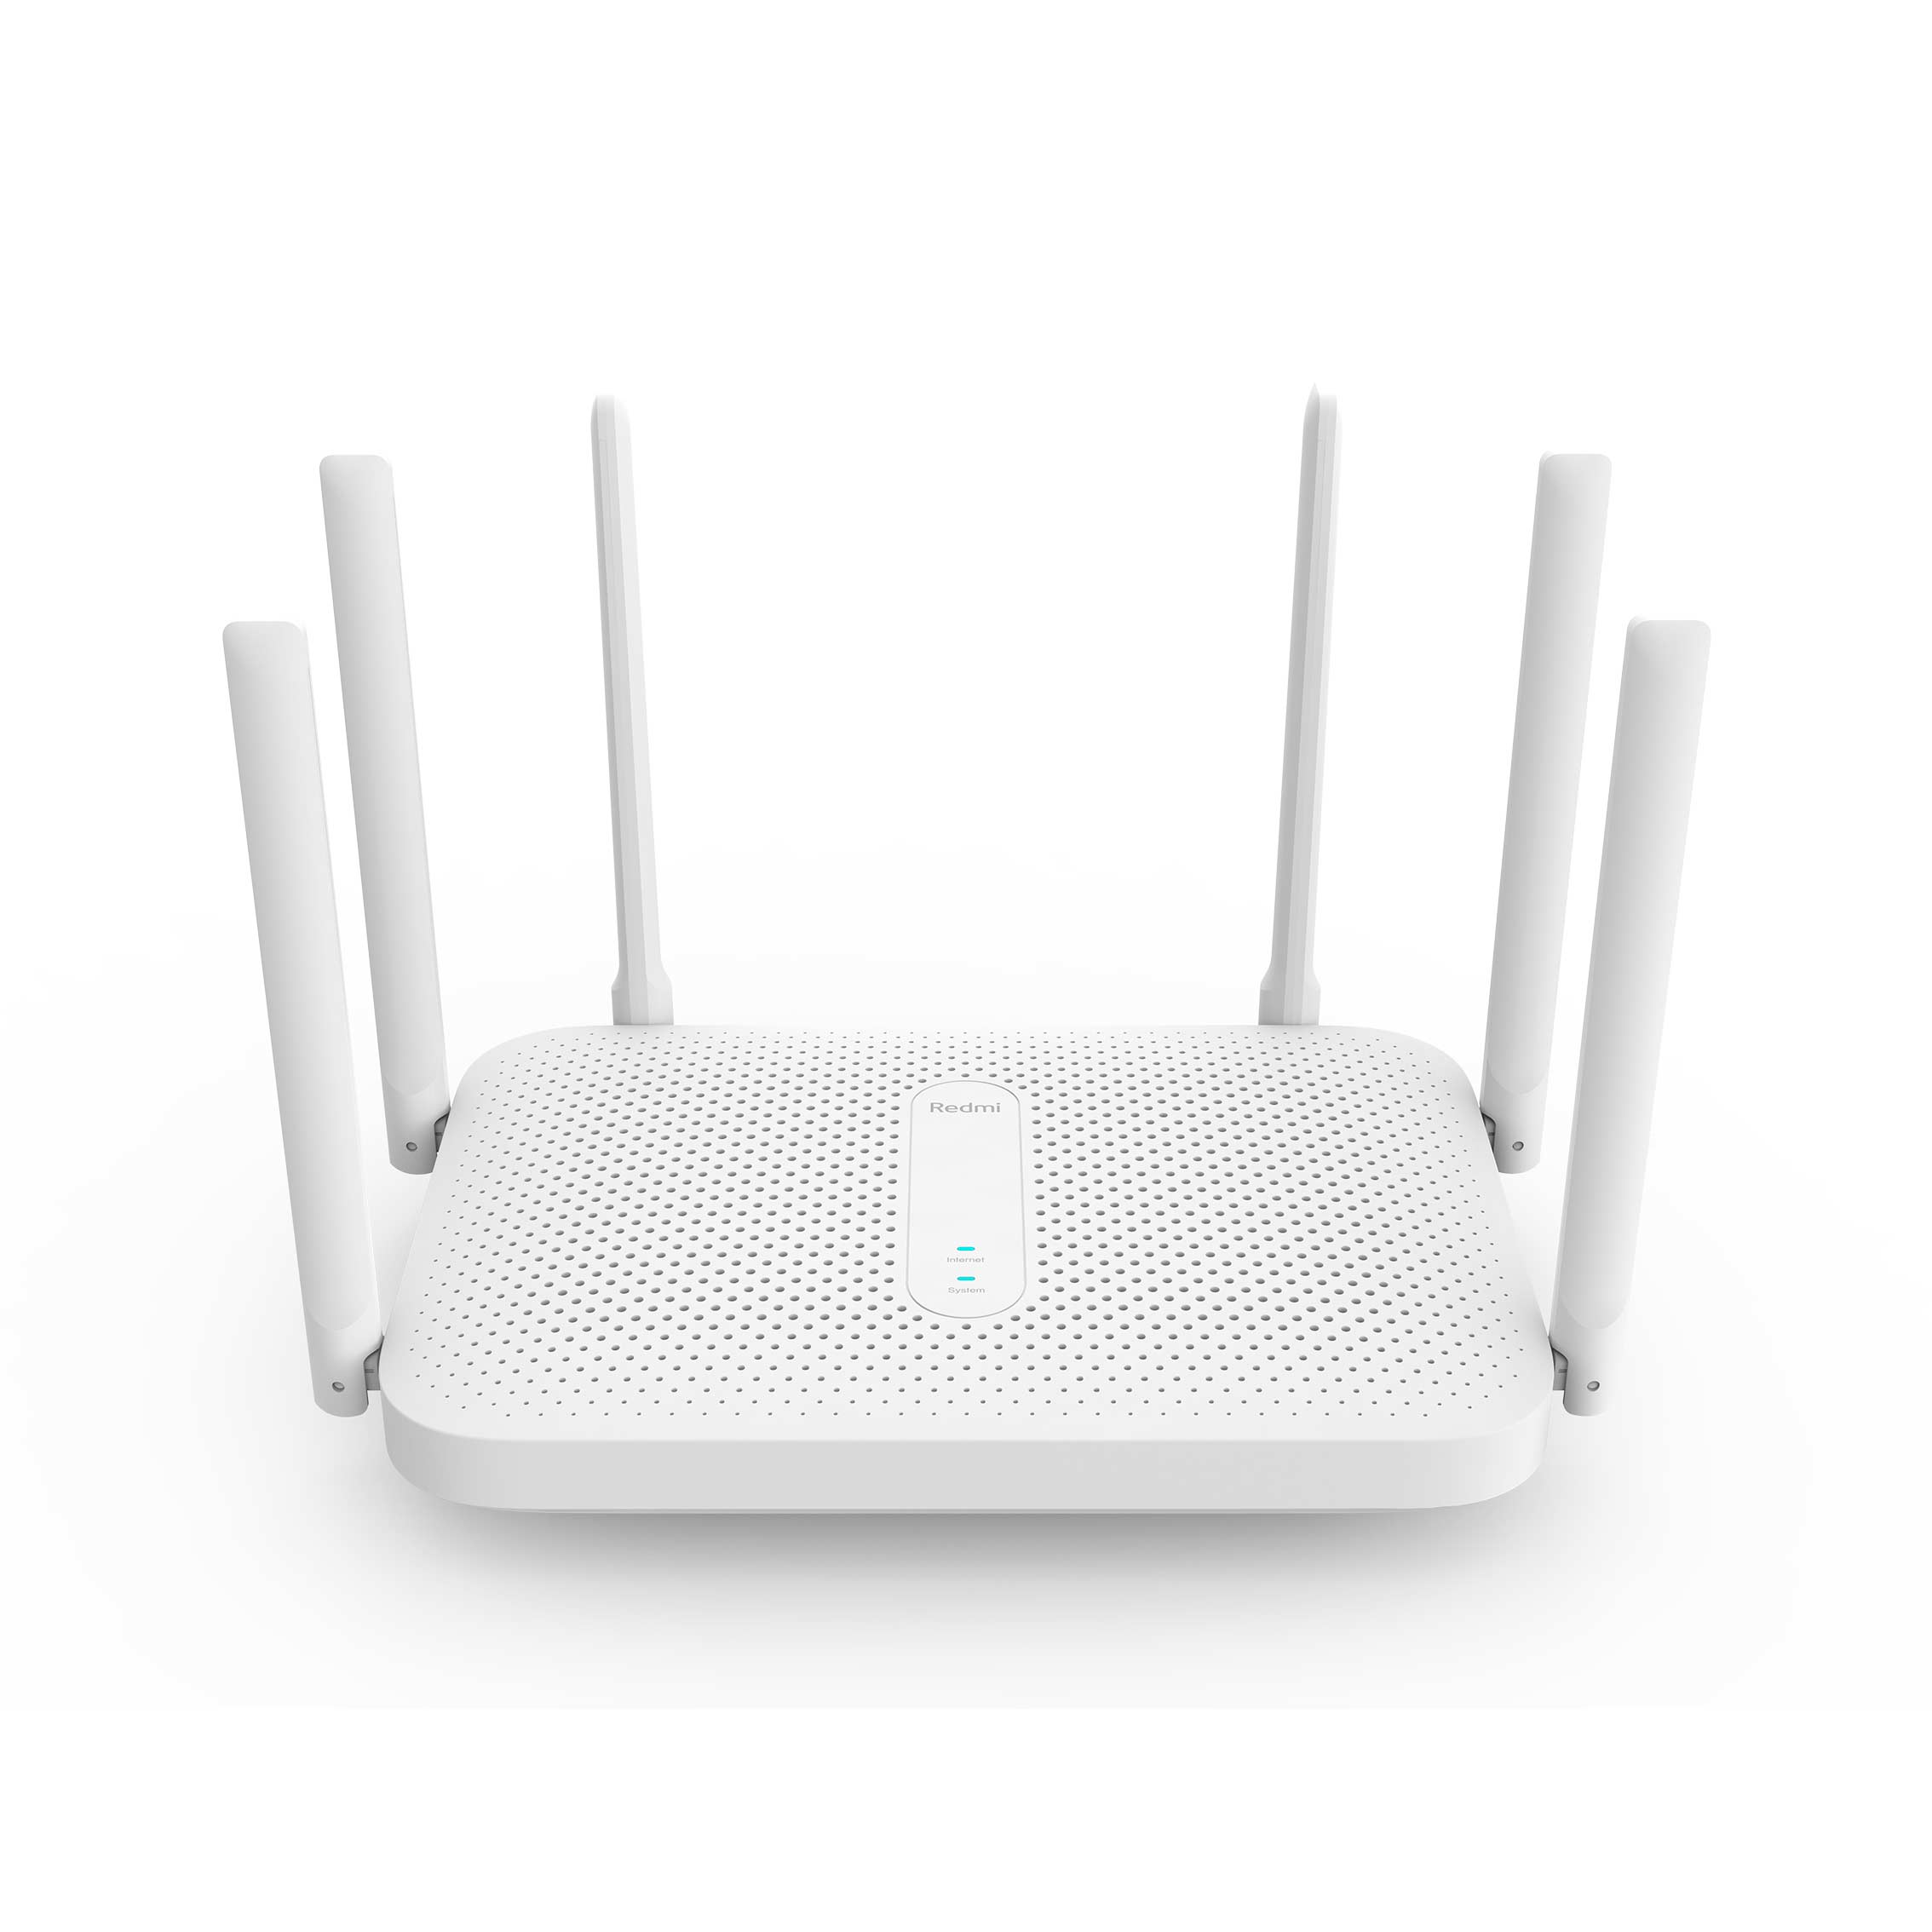 NEUE Xiaomi Redmi Router AX5 WiFi 6 1800 5-Core 256M Speicher Netz Home IoT 4 Signal Verstärker 2,4G 5GHz Sowohl 2 Dual-Band OFDMA 4